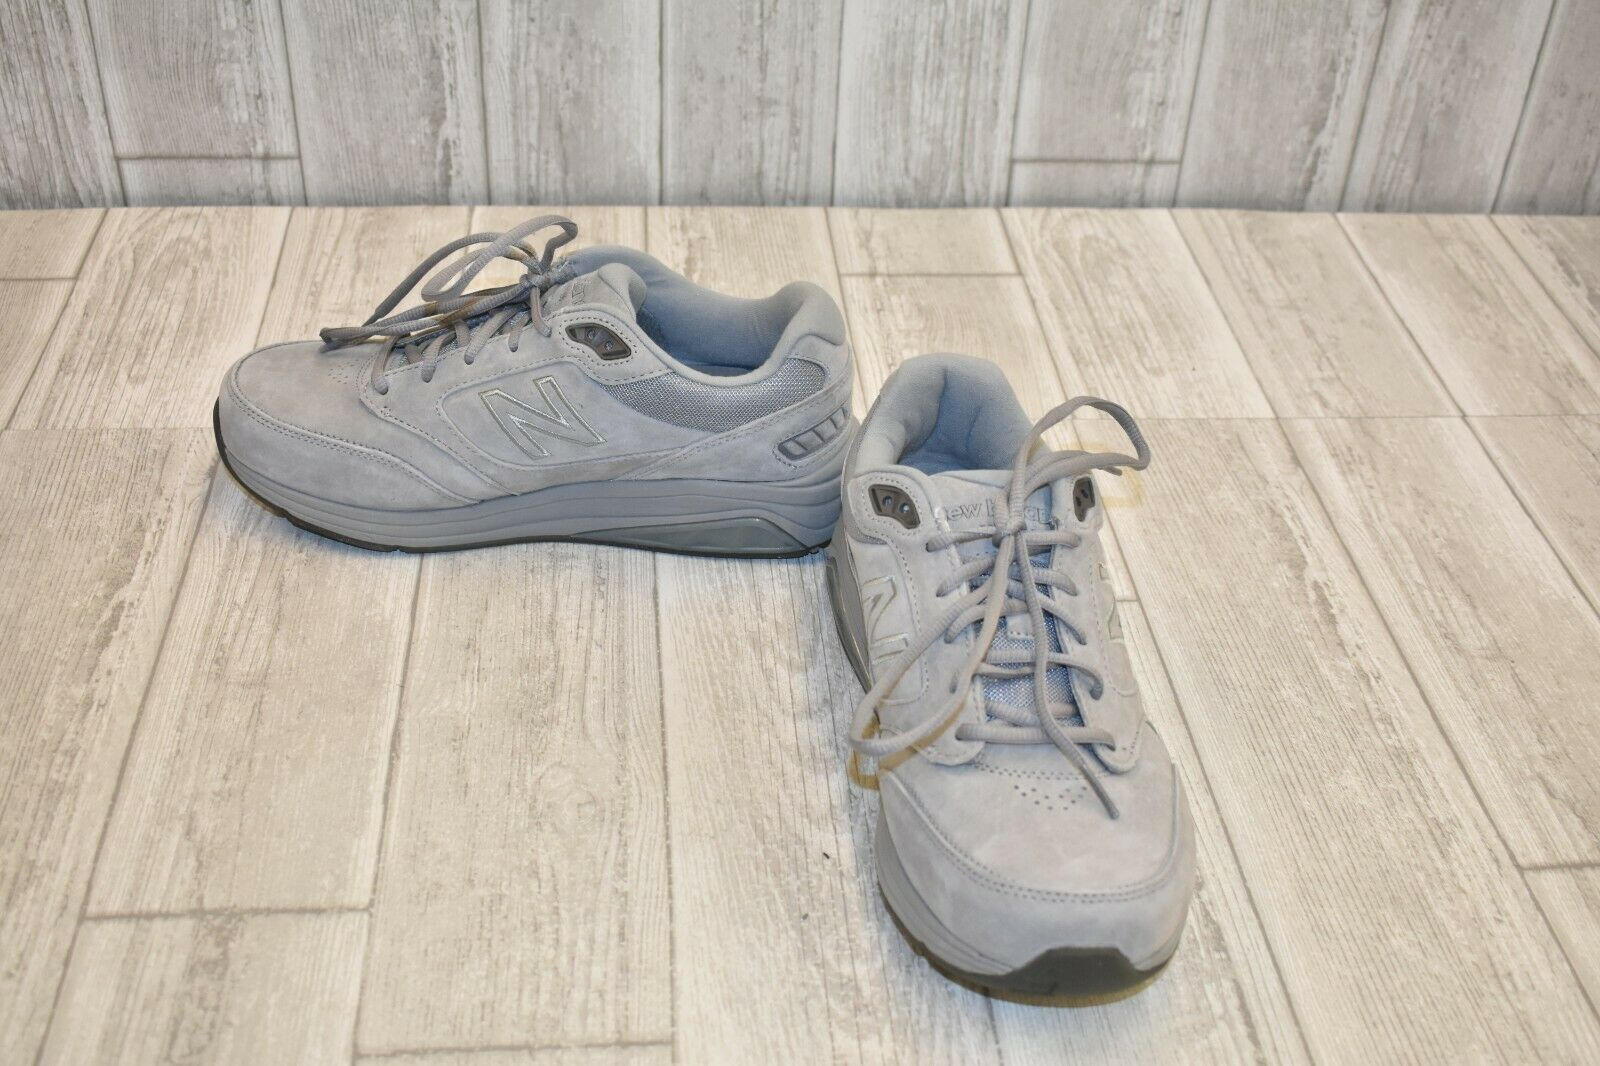 New Balance 928v3 Walking shoes, Men's Size 7.5-6E, Grey